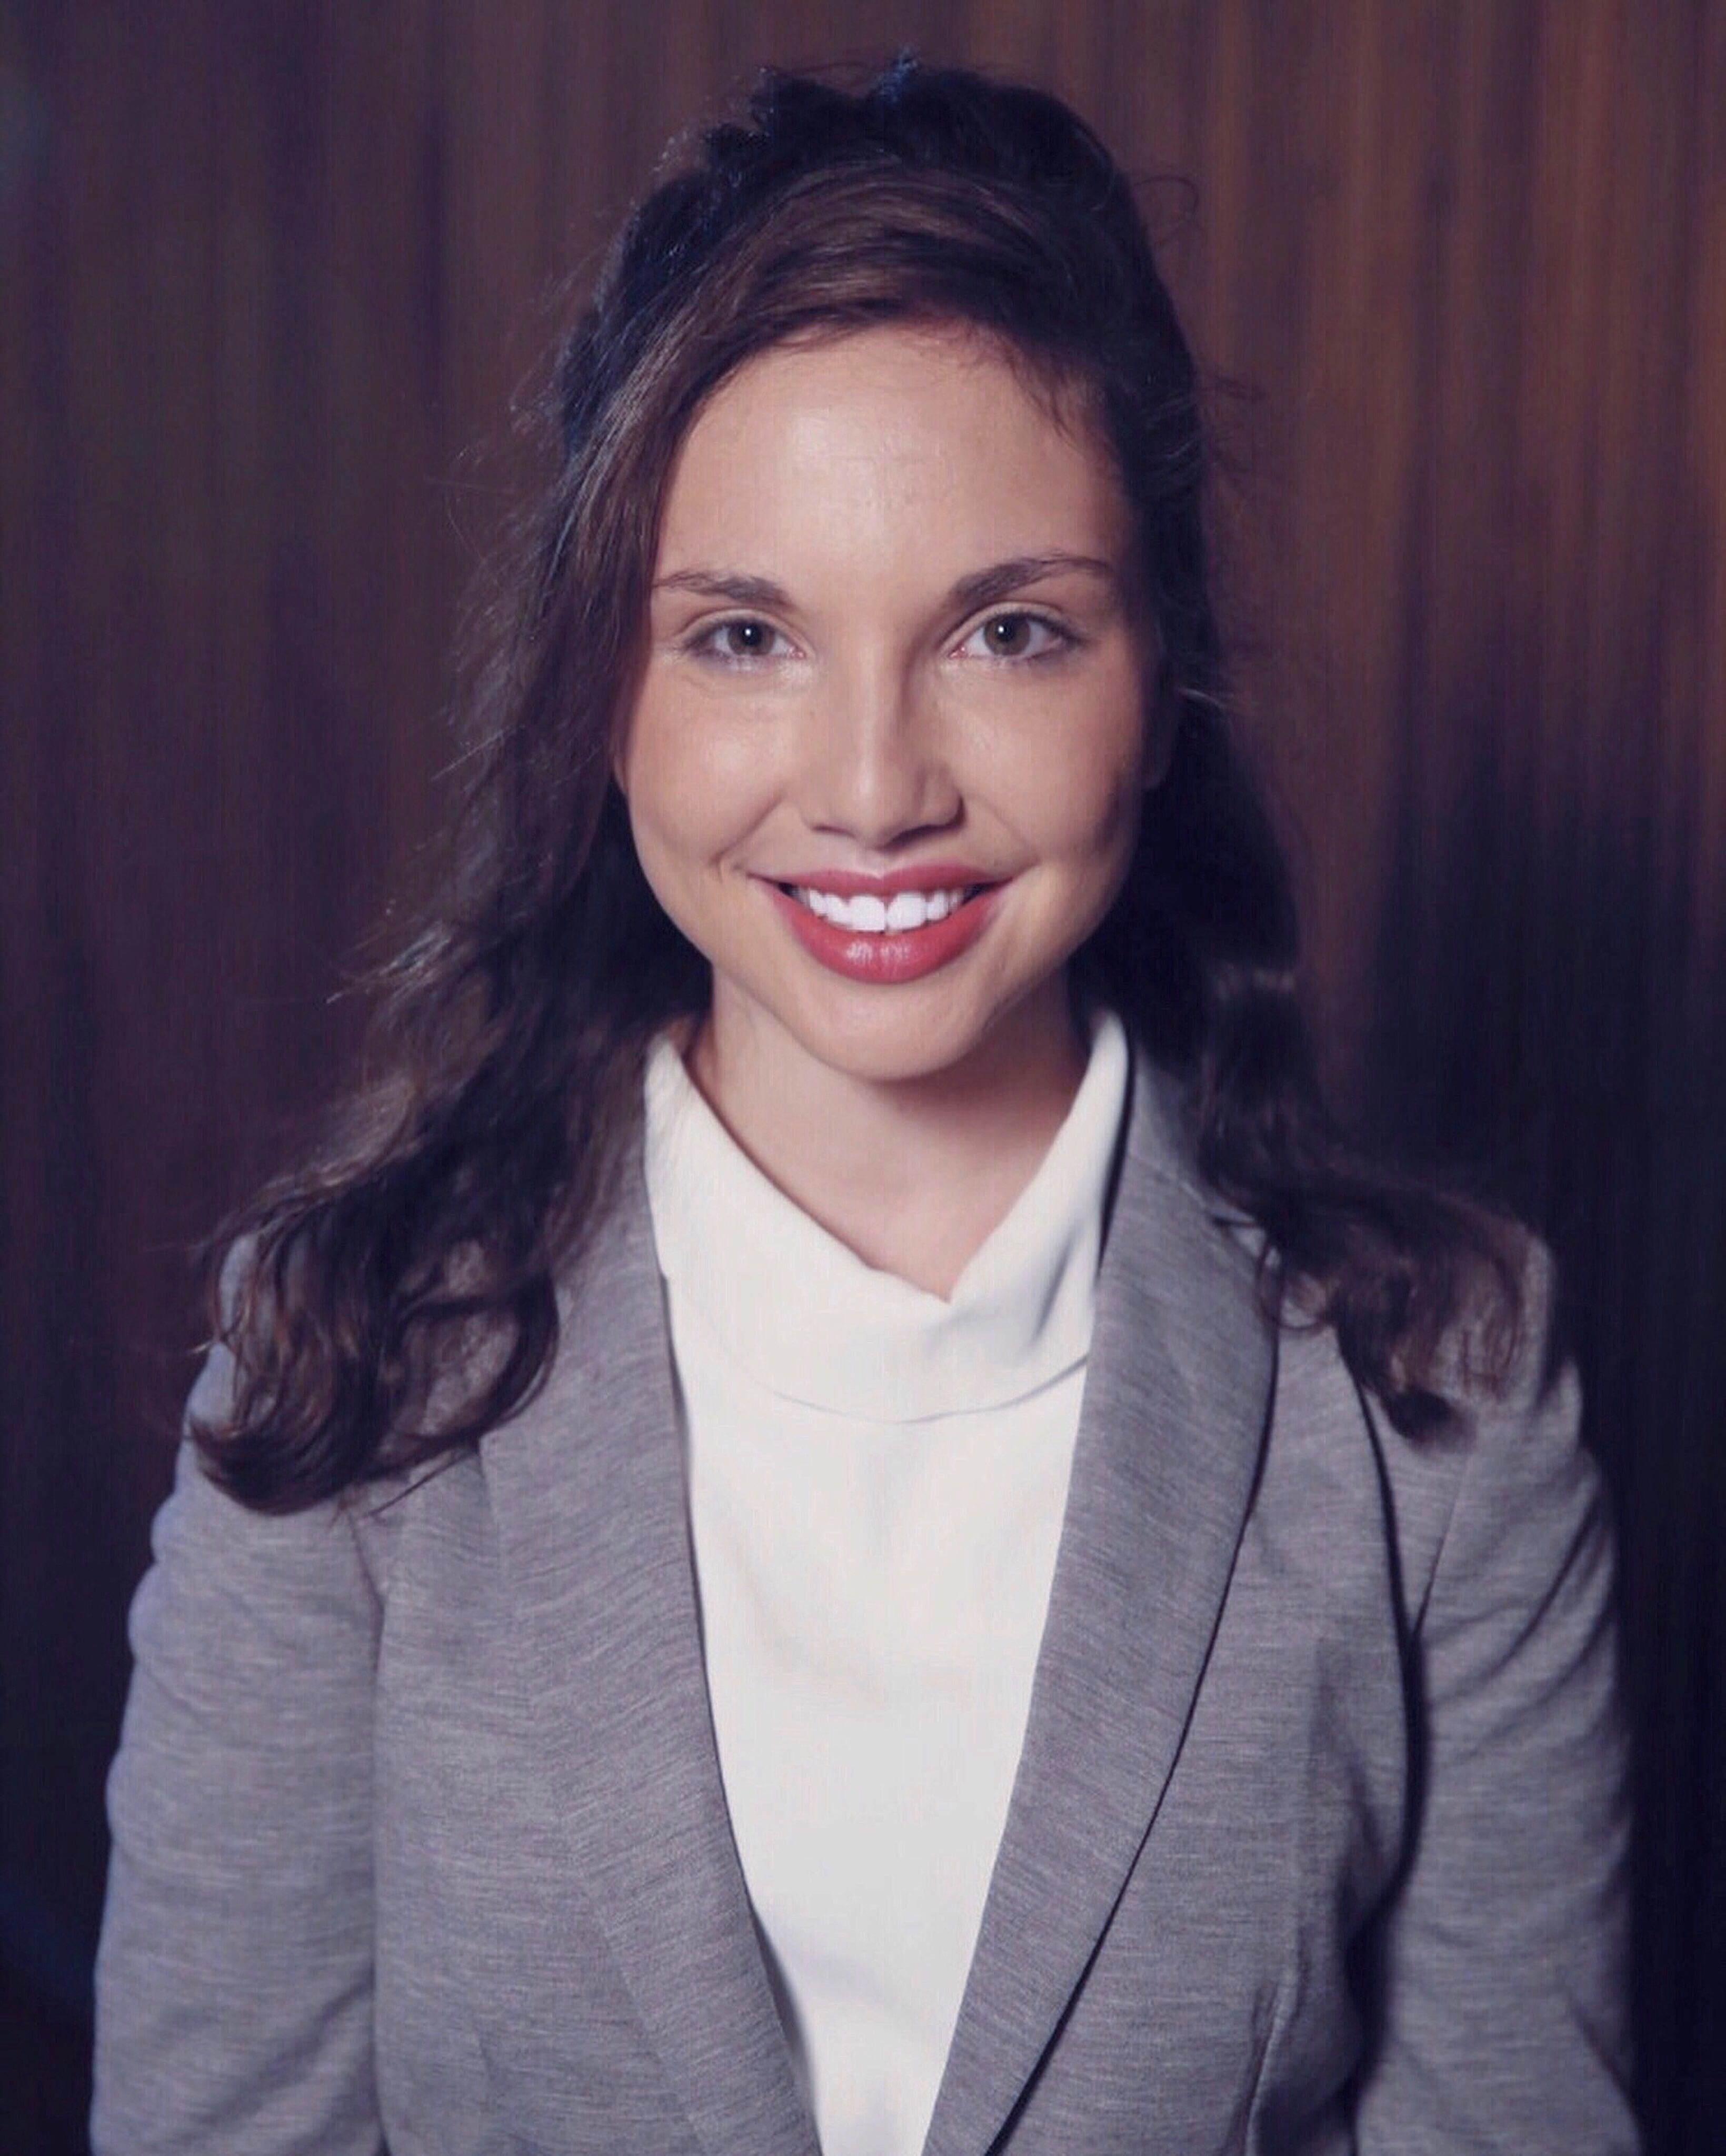 Alexis Boumstein